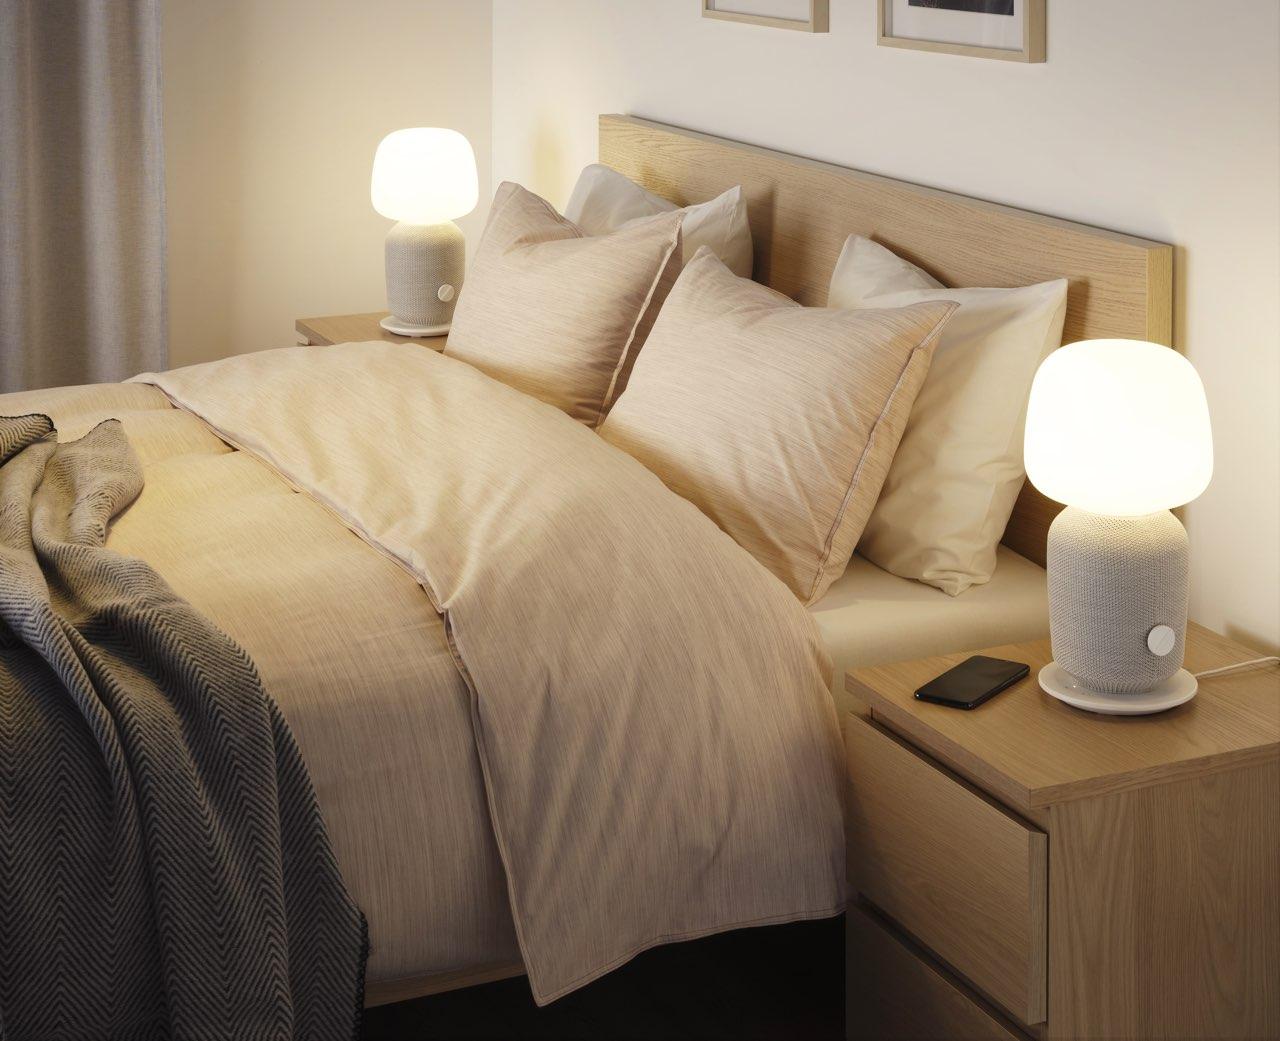 IKEA Symfonisk tafellamp speaker